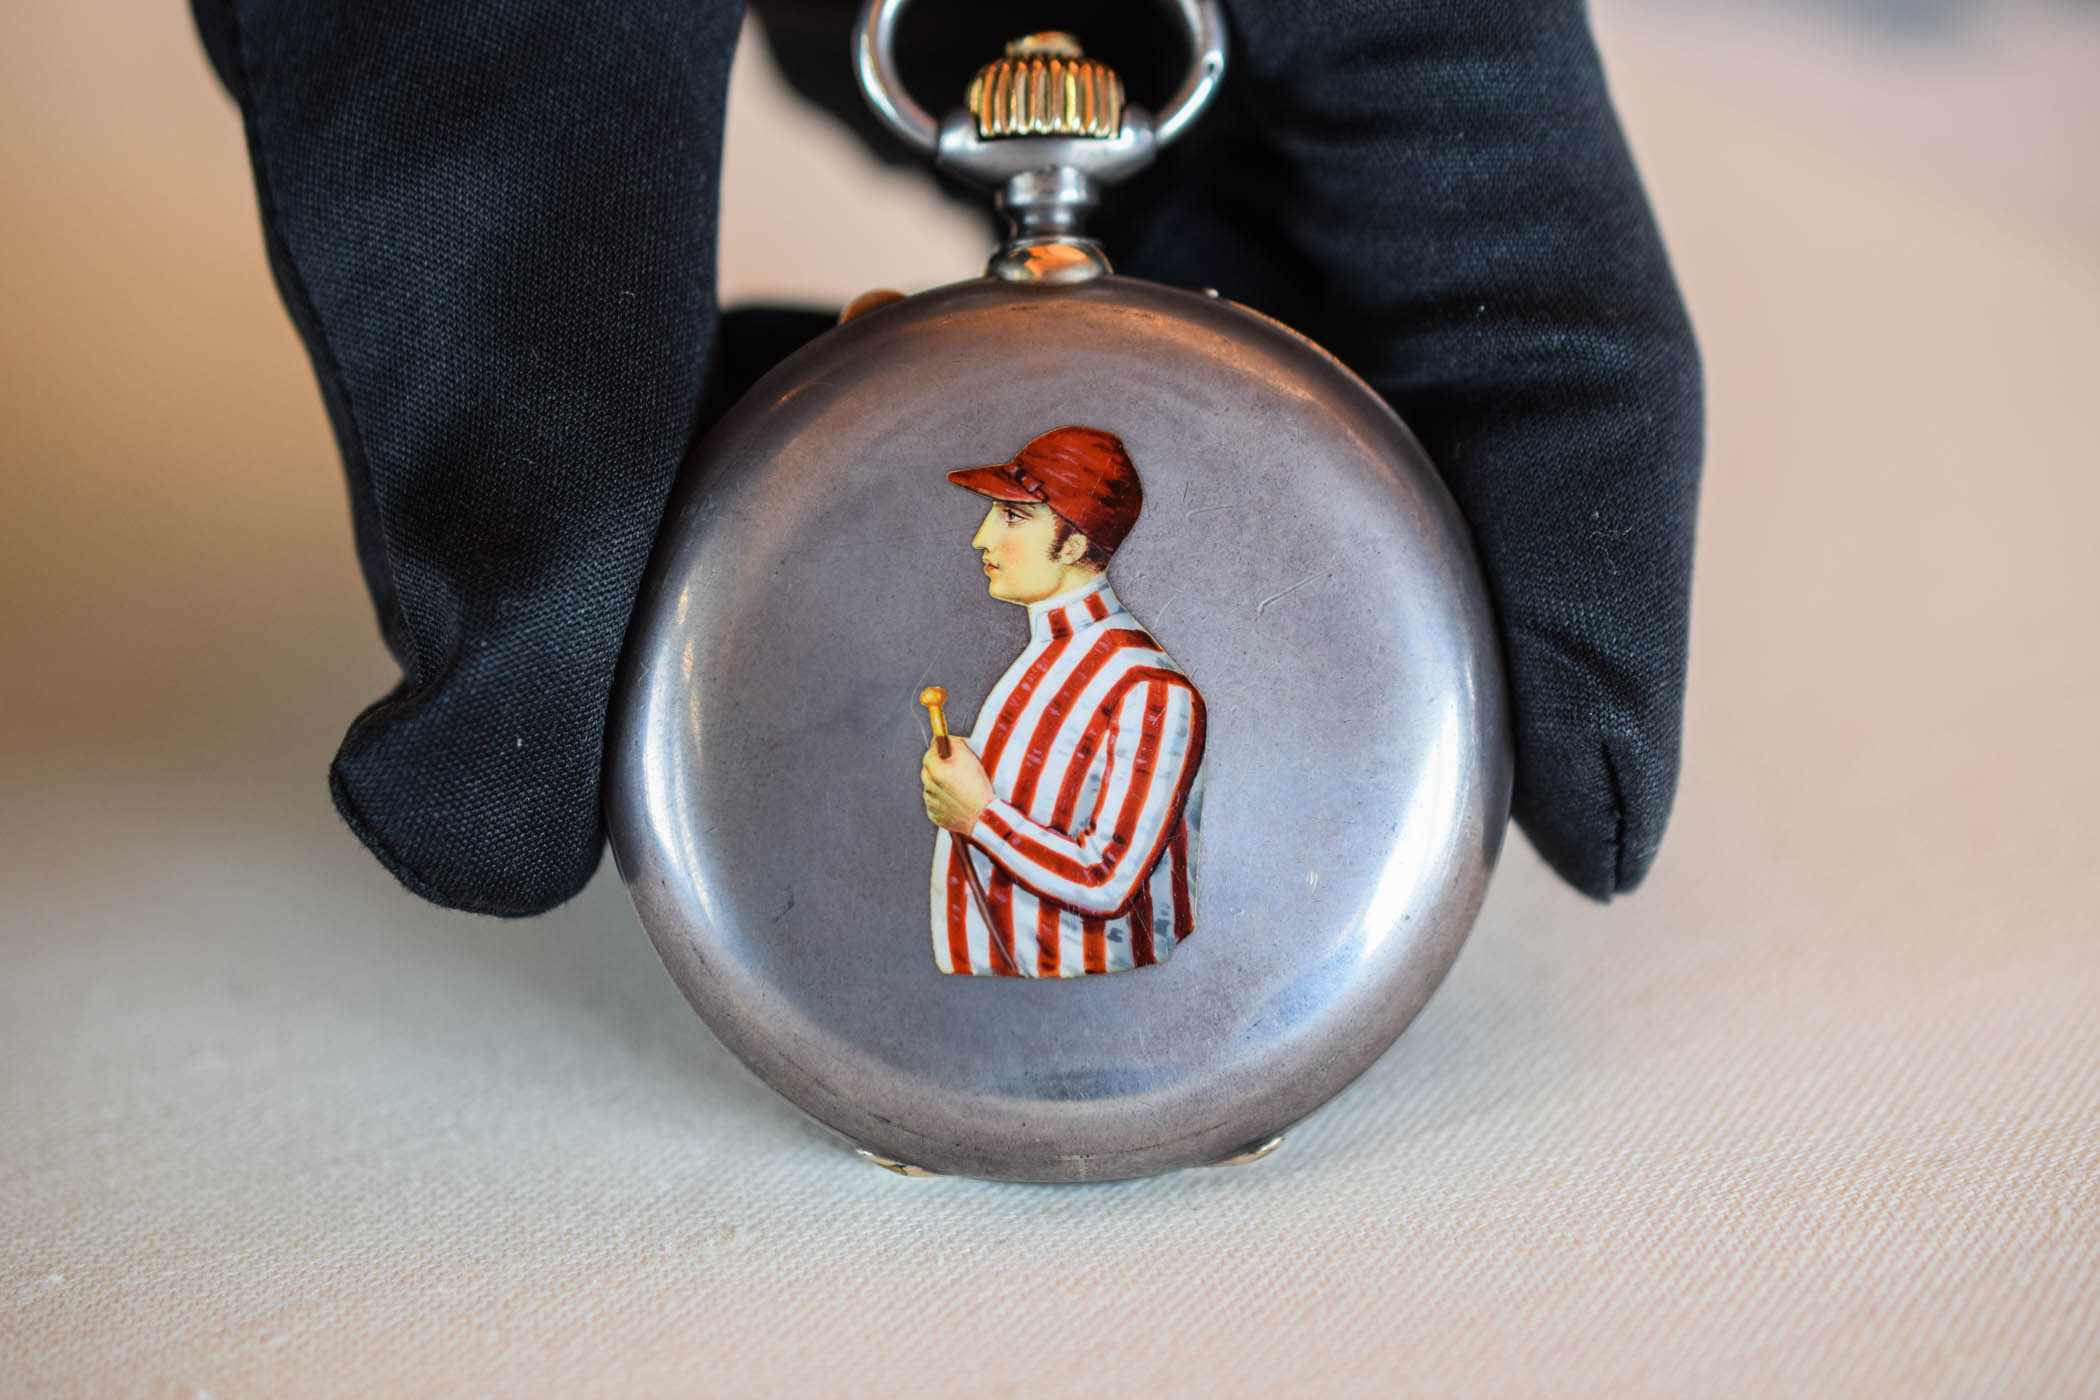 Vacheron Constantin first Split Second chronograph 1889 - 1